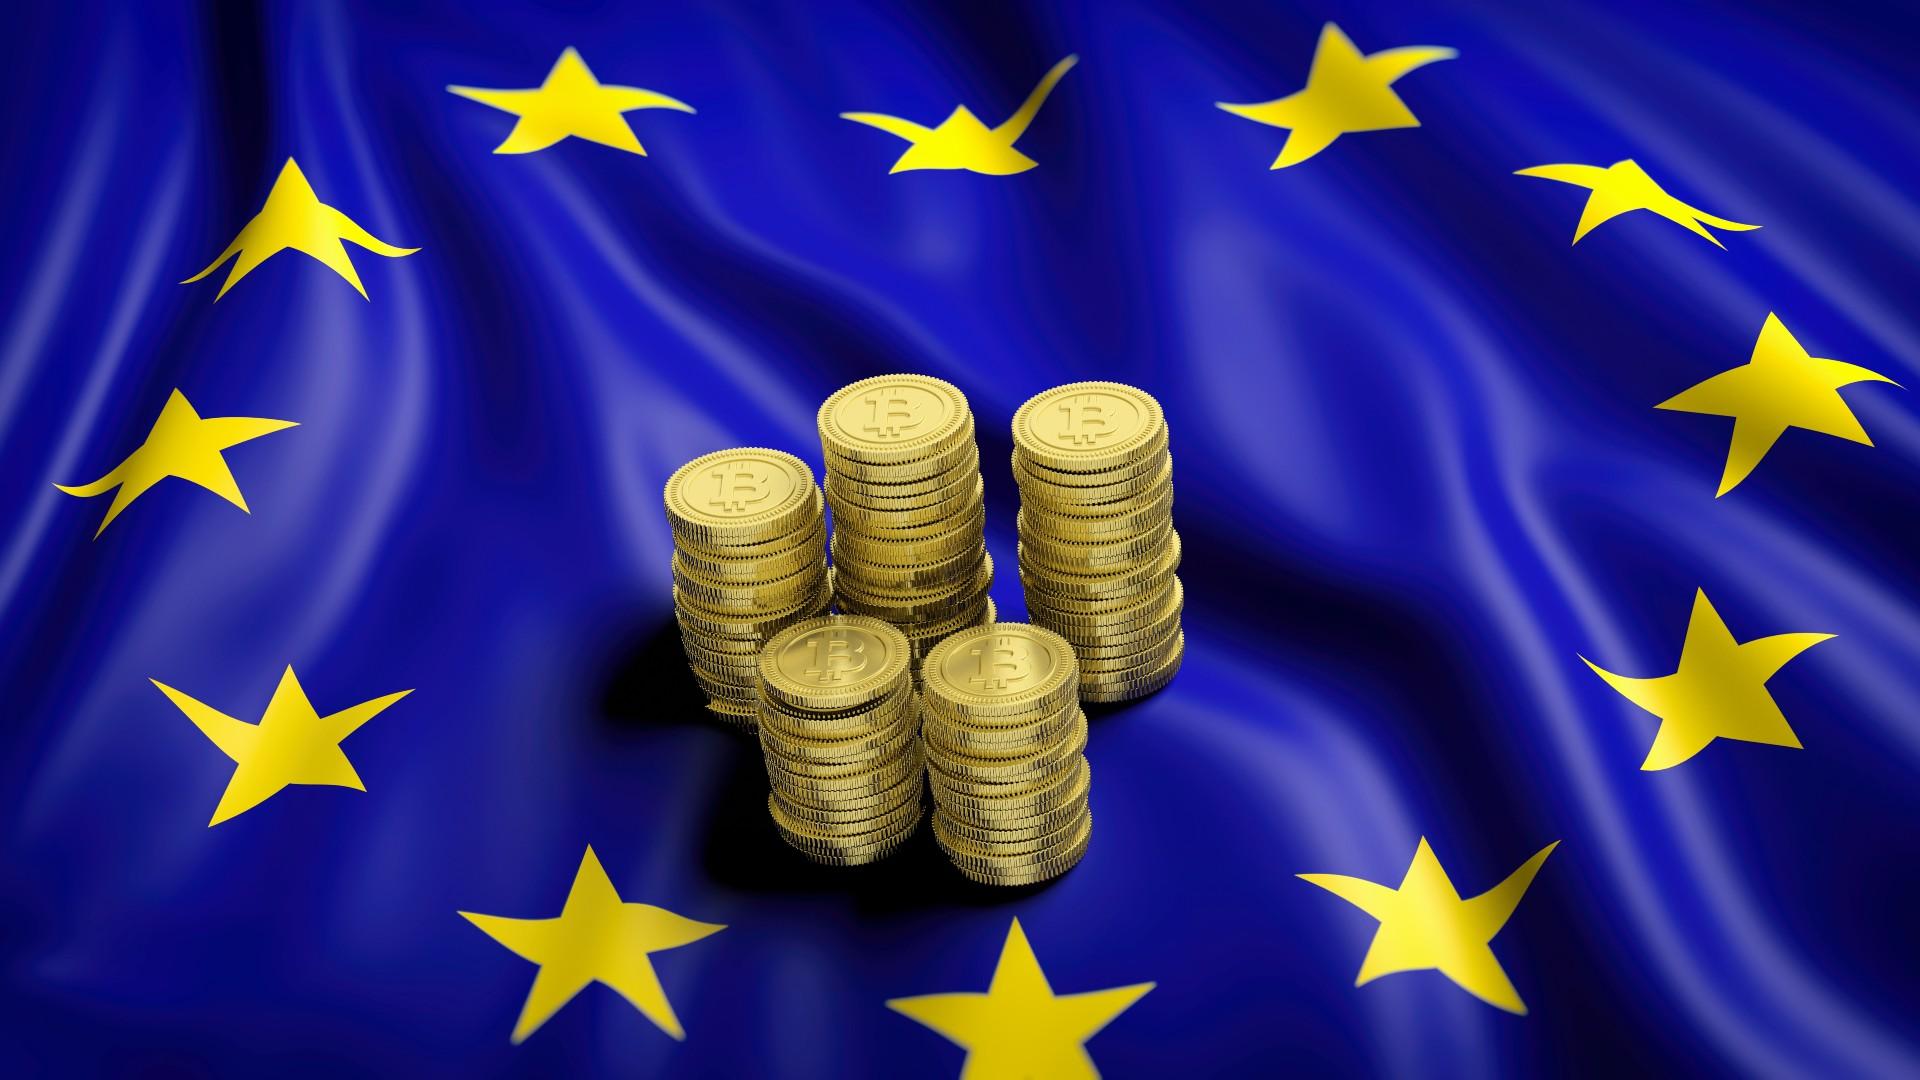 AGENDA CRIPTO ASCUNSA IN LABORATOARELE LEGISLATIEI UE – Avertisment dur: Noile reglementari indica incalcari infricosatoare ale libertatii financiare